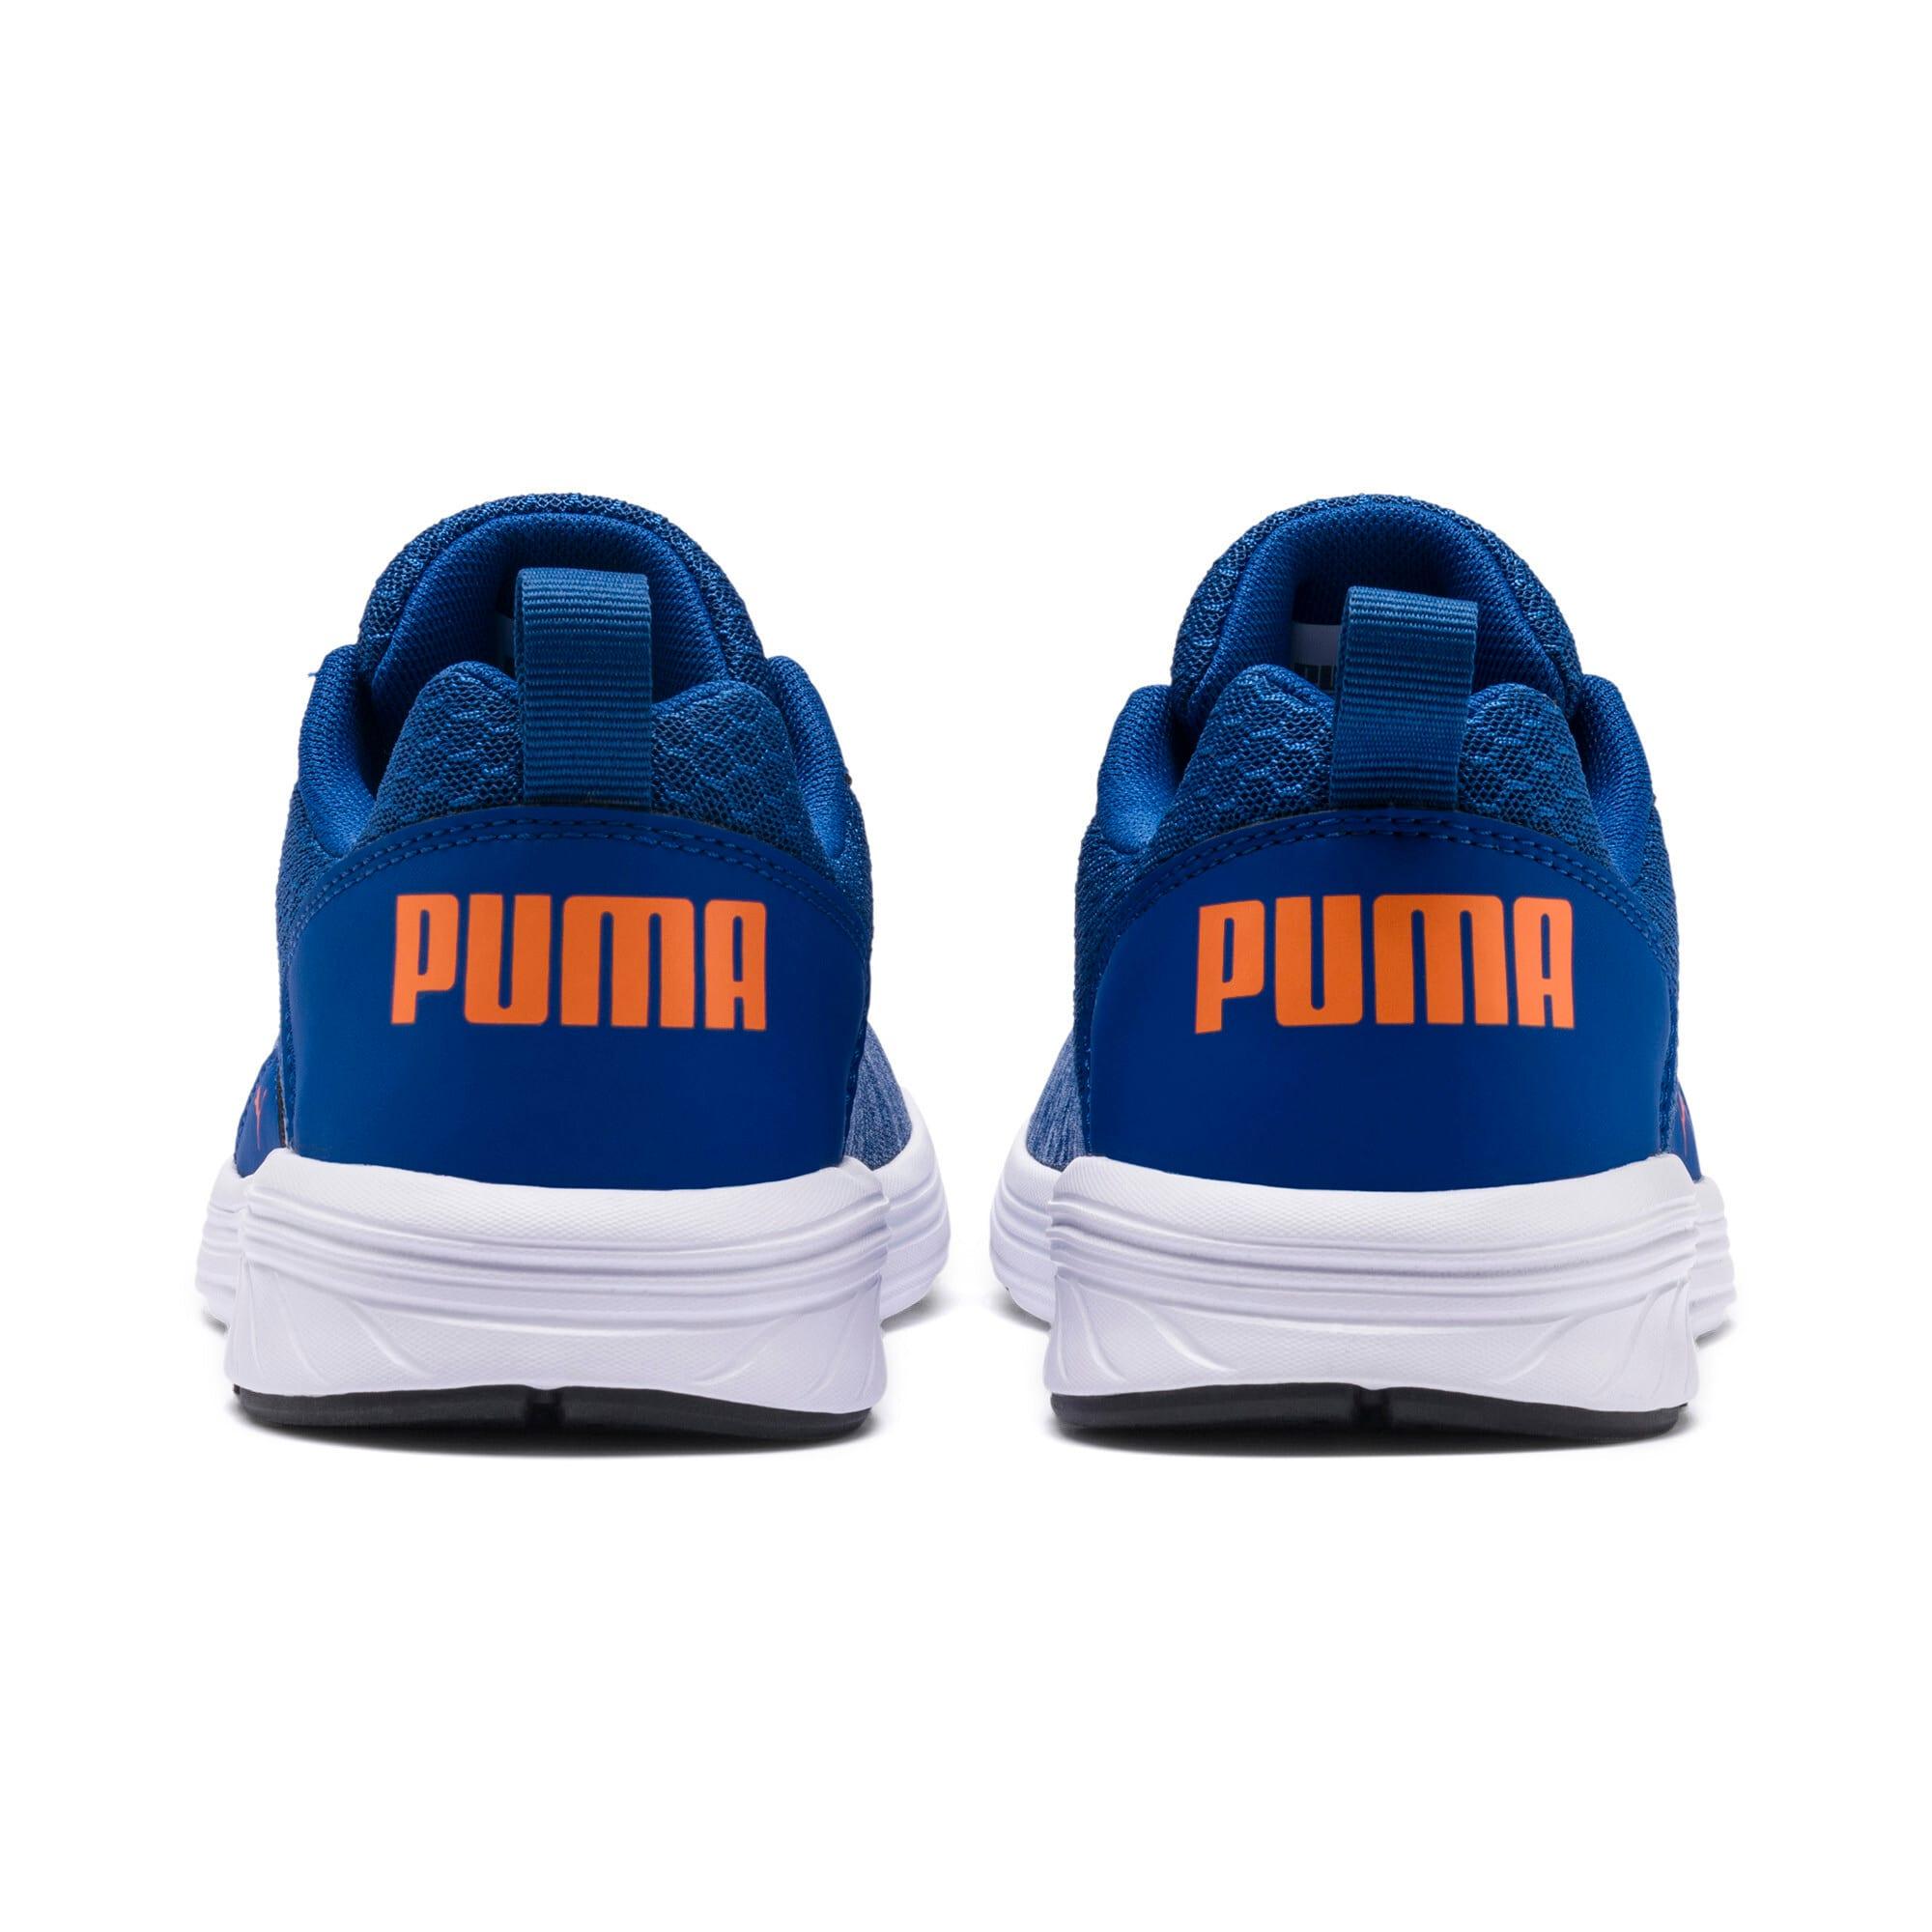 Thumbnail 4 of NRGY Comet Kids' Training Shoes, Galaxy Blue-White-Orange, medium-IND